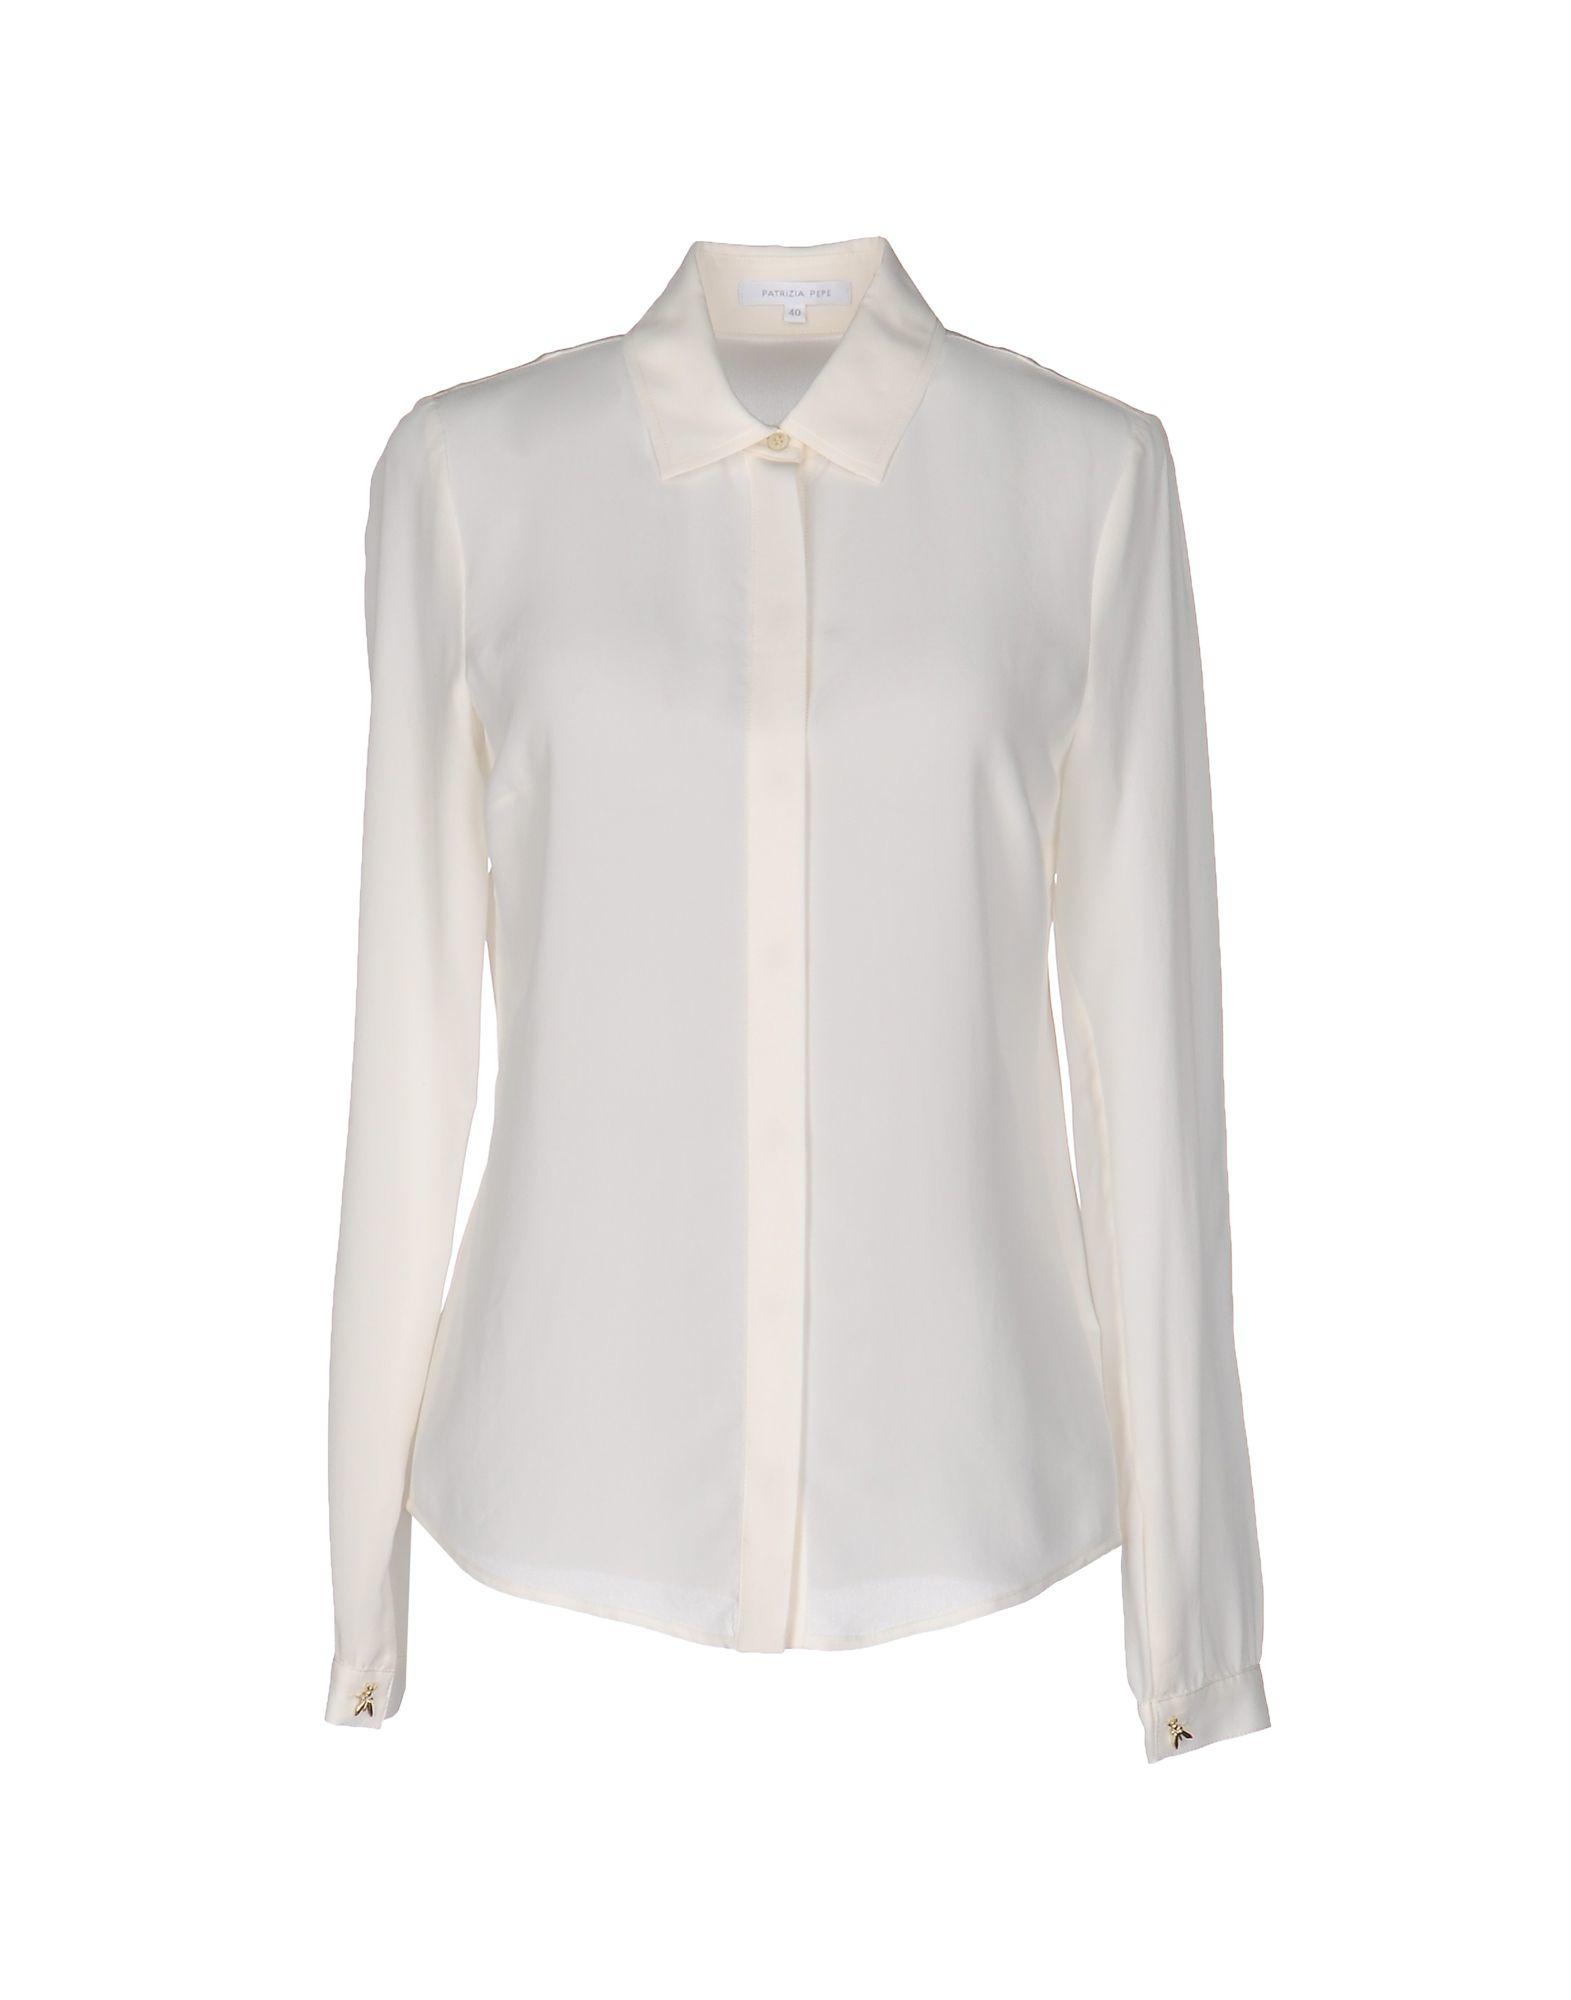 Patrizia Pepe Shirt In White Lyst